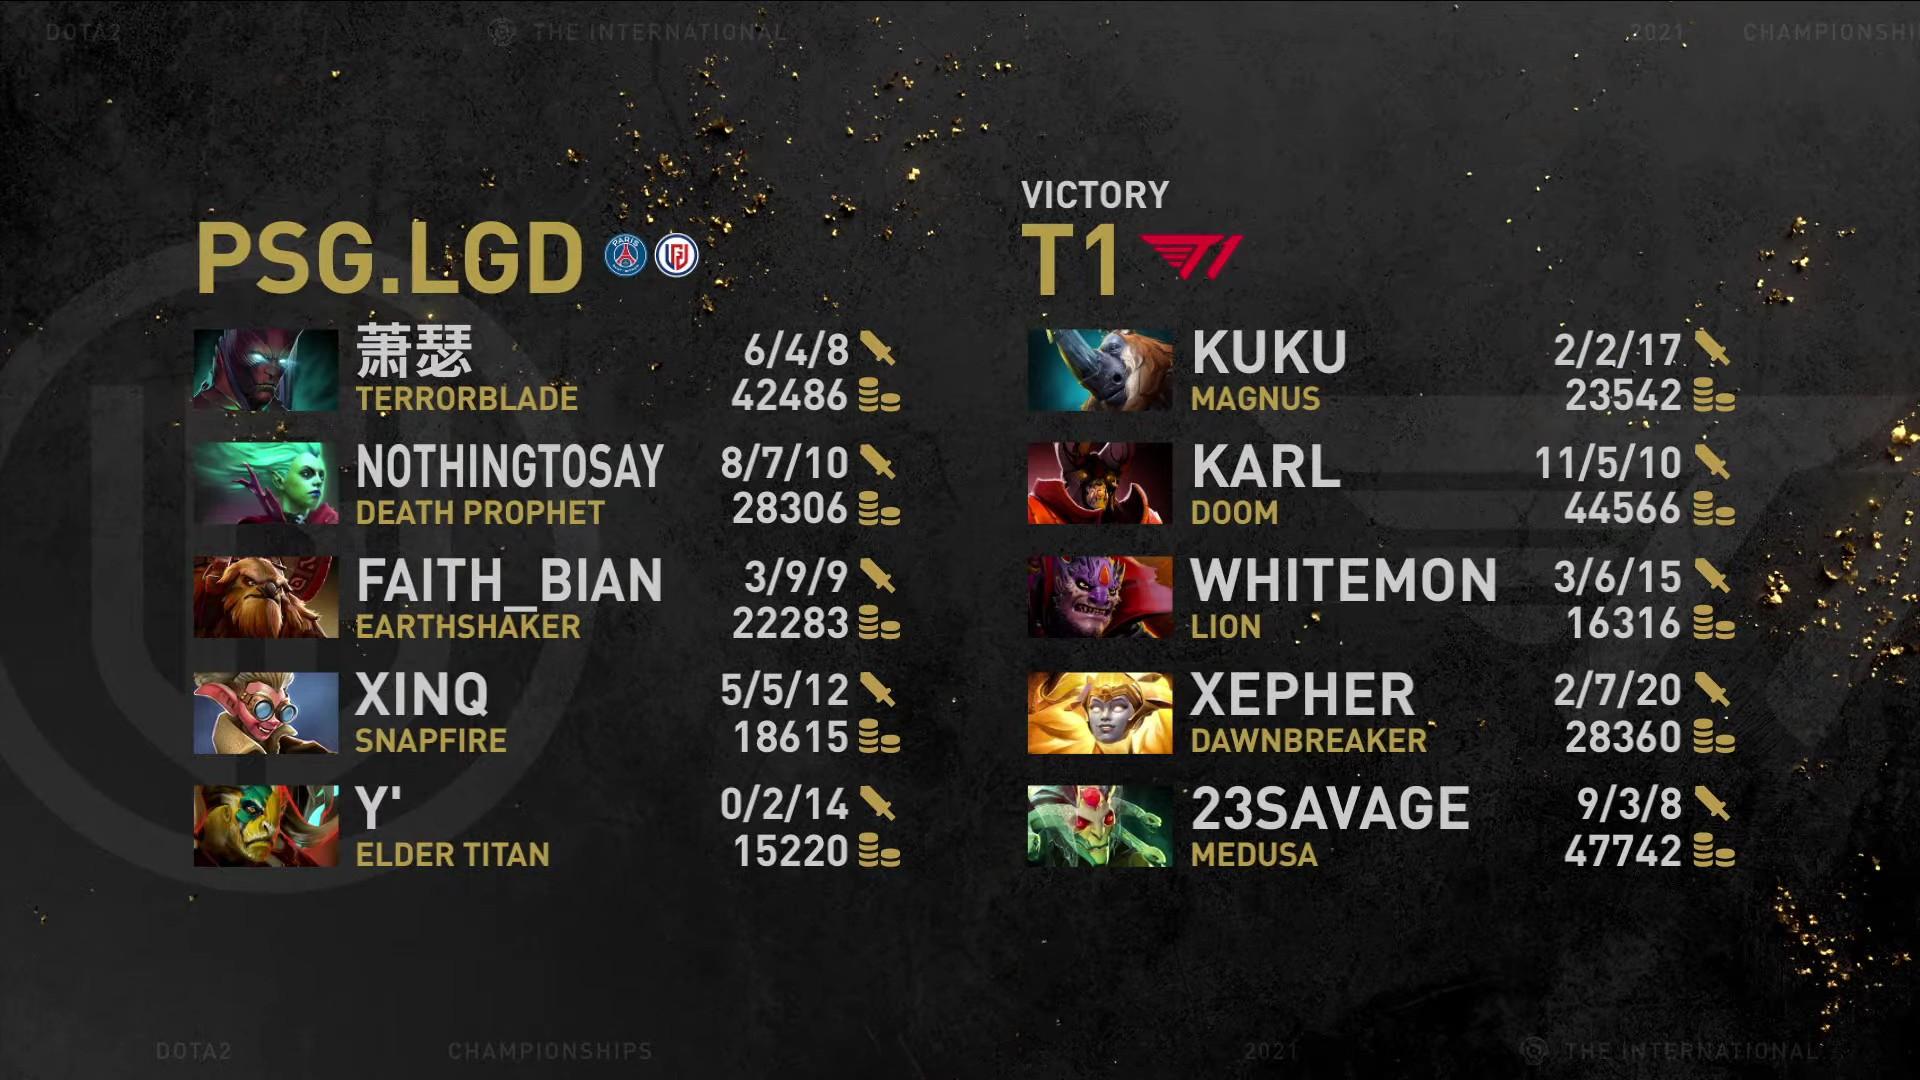 TI10-PSG.LGD-def-T1-Game-2 T1 falls to PSG.LGD in epic TI10 clash DOTA 2 ESports News  - philippine sports news